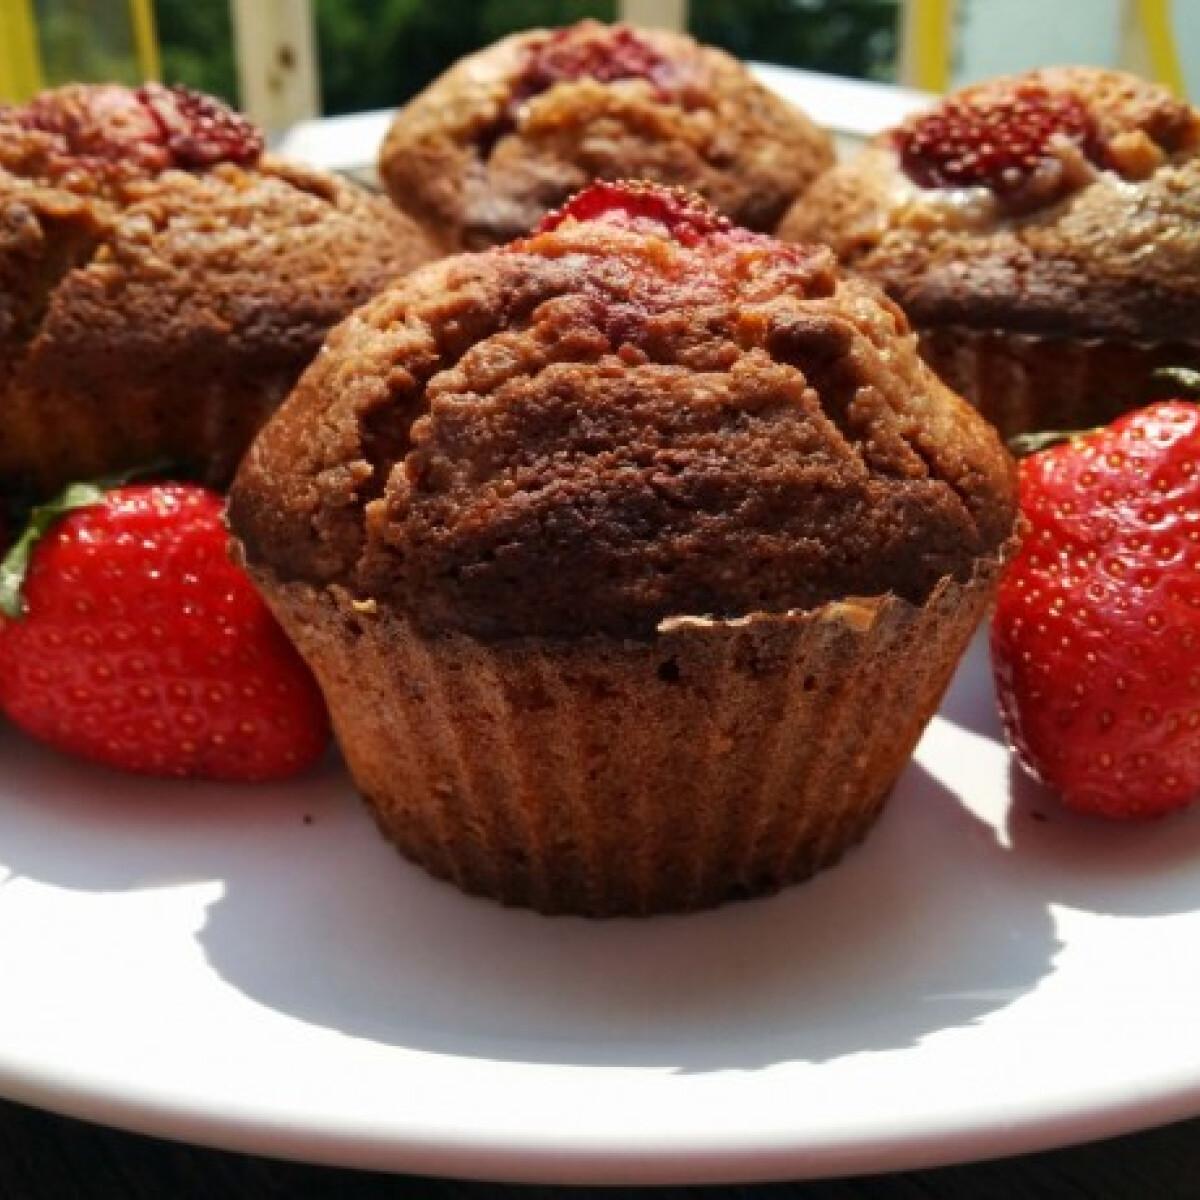 Ezen a képen: Cukormentes citromos-epres muffin